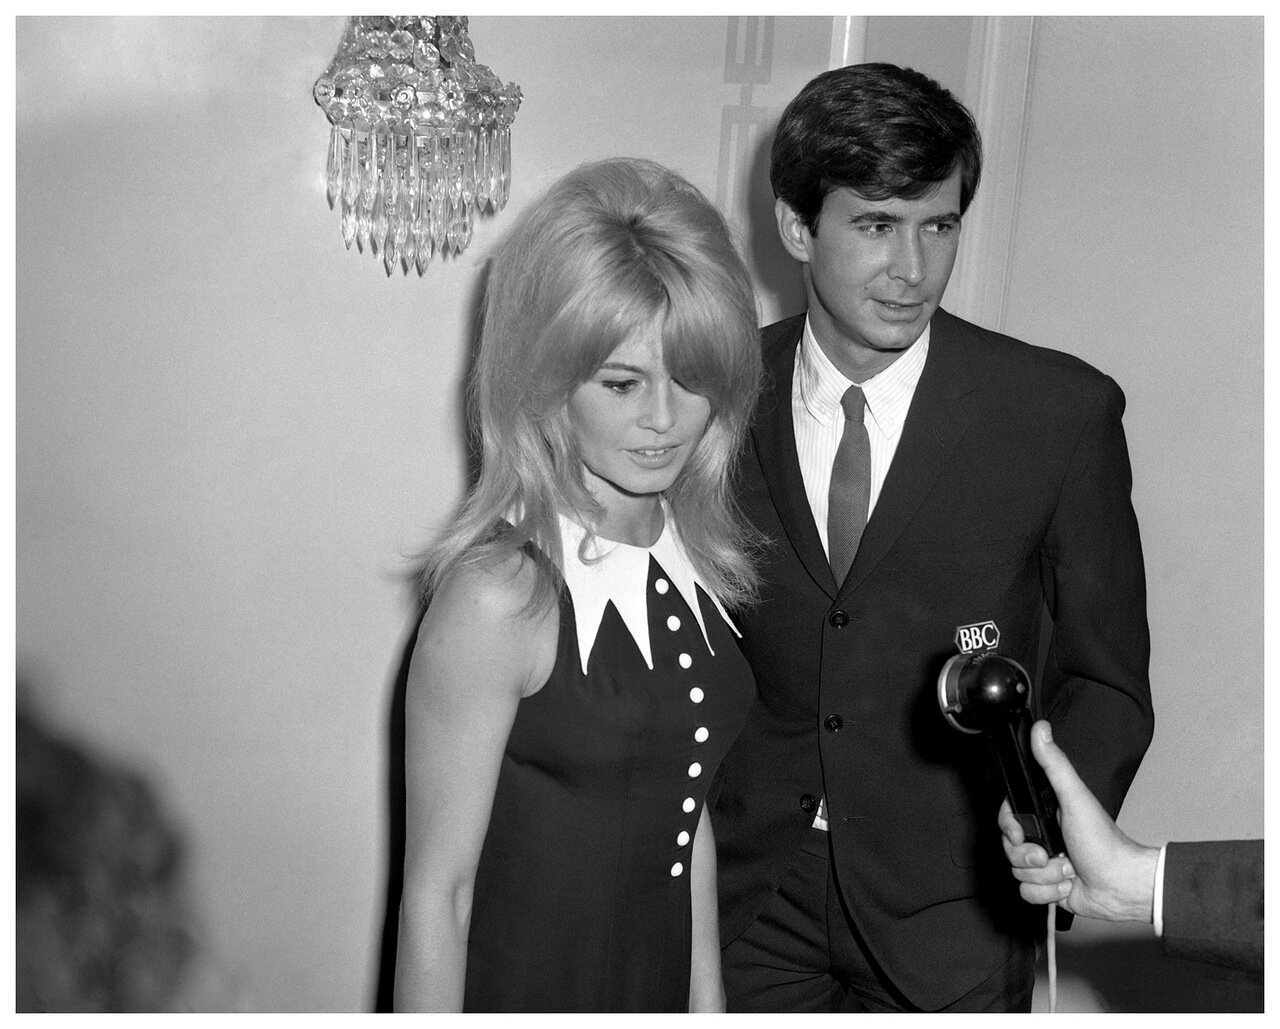 1964. Бриджитт Бардо и Энтони Перкинс